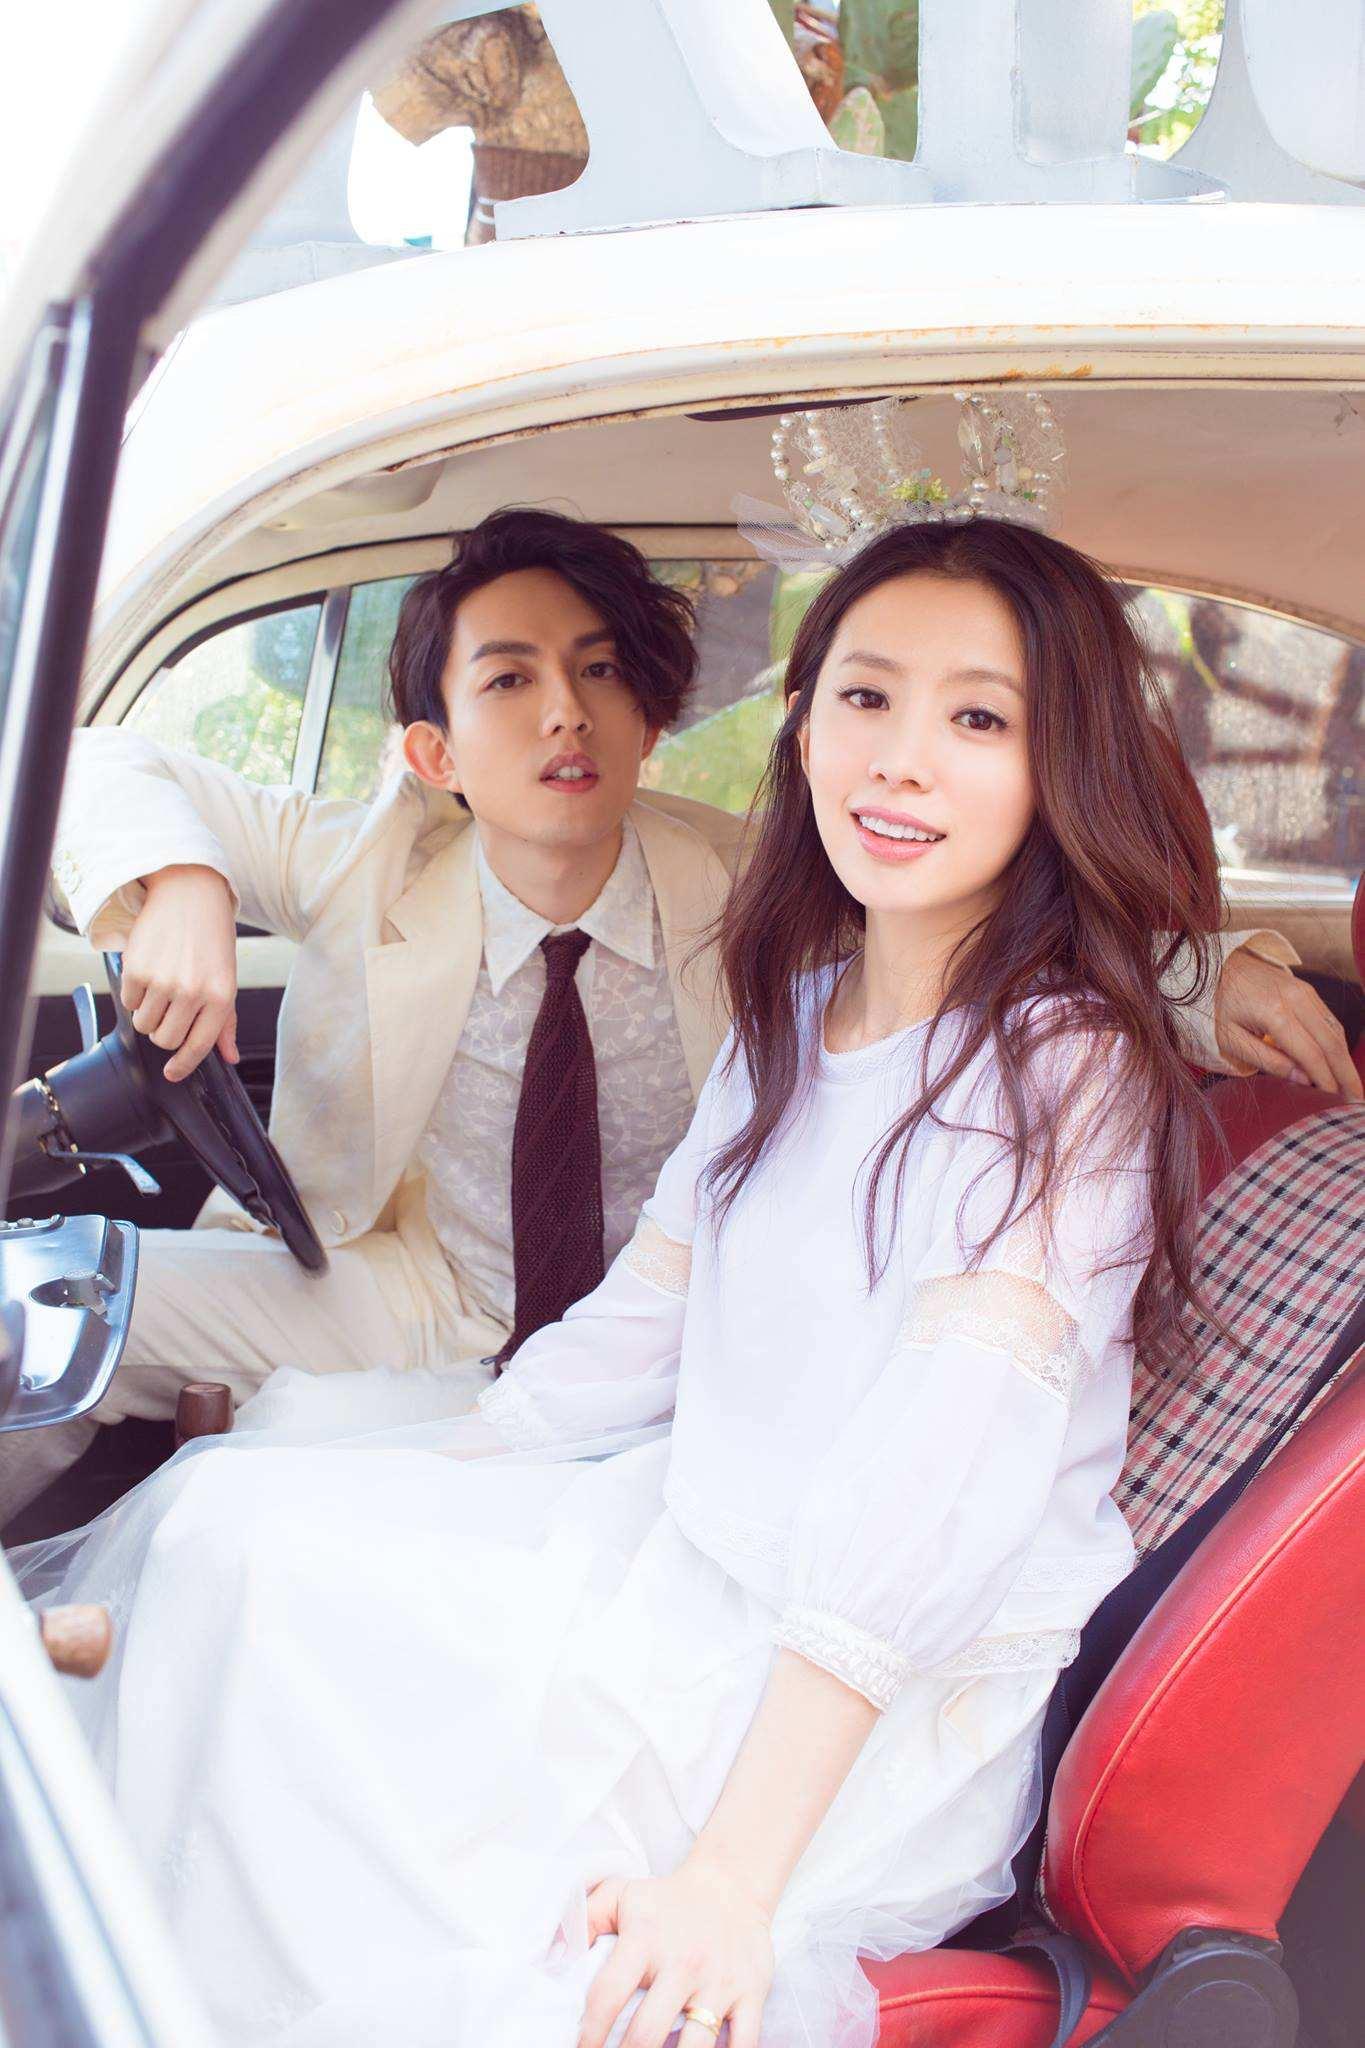 KIKI沒有穿著魚尾禮服或大展身材,身上穿著兩截式的簡單白色系套裝,帶點絲質的材質,看起來非常純真可愛,林宥嘉則是換上白馬王子的裝束。